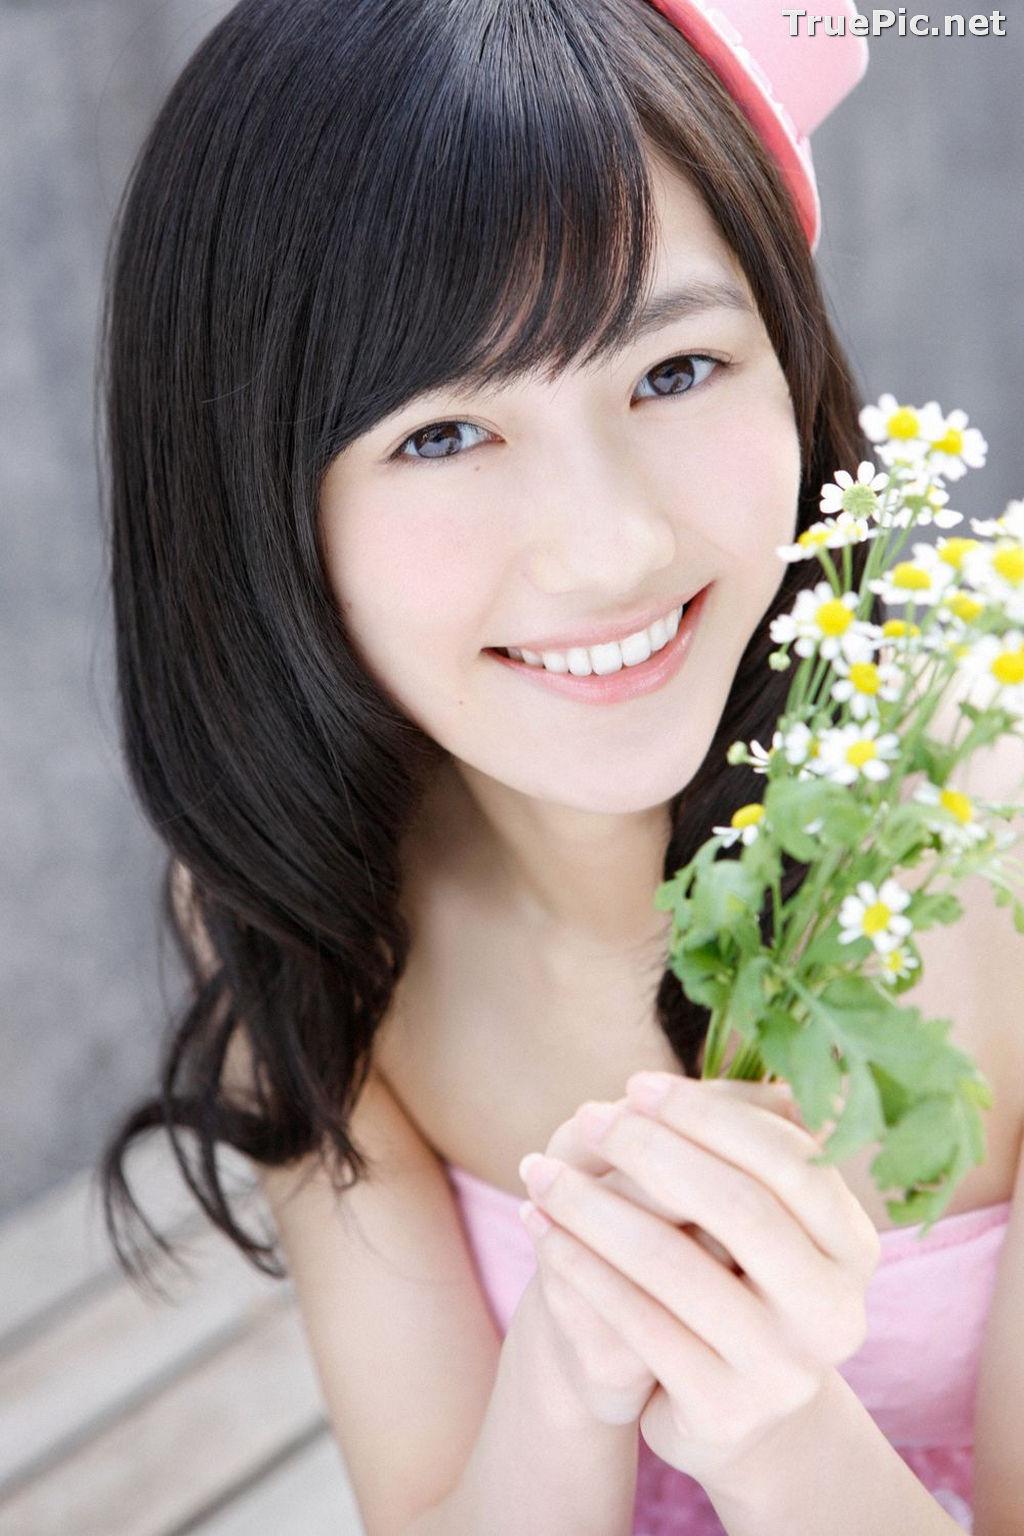 Image [YS Web] Vol.531 - Japanese Idol Girl Group (AKB48) - Mayu Watanabe - TruePic.net - Picture-6